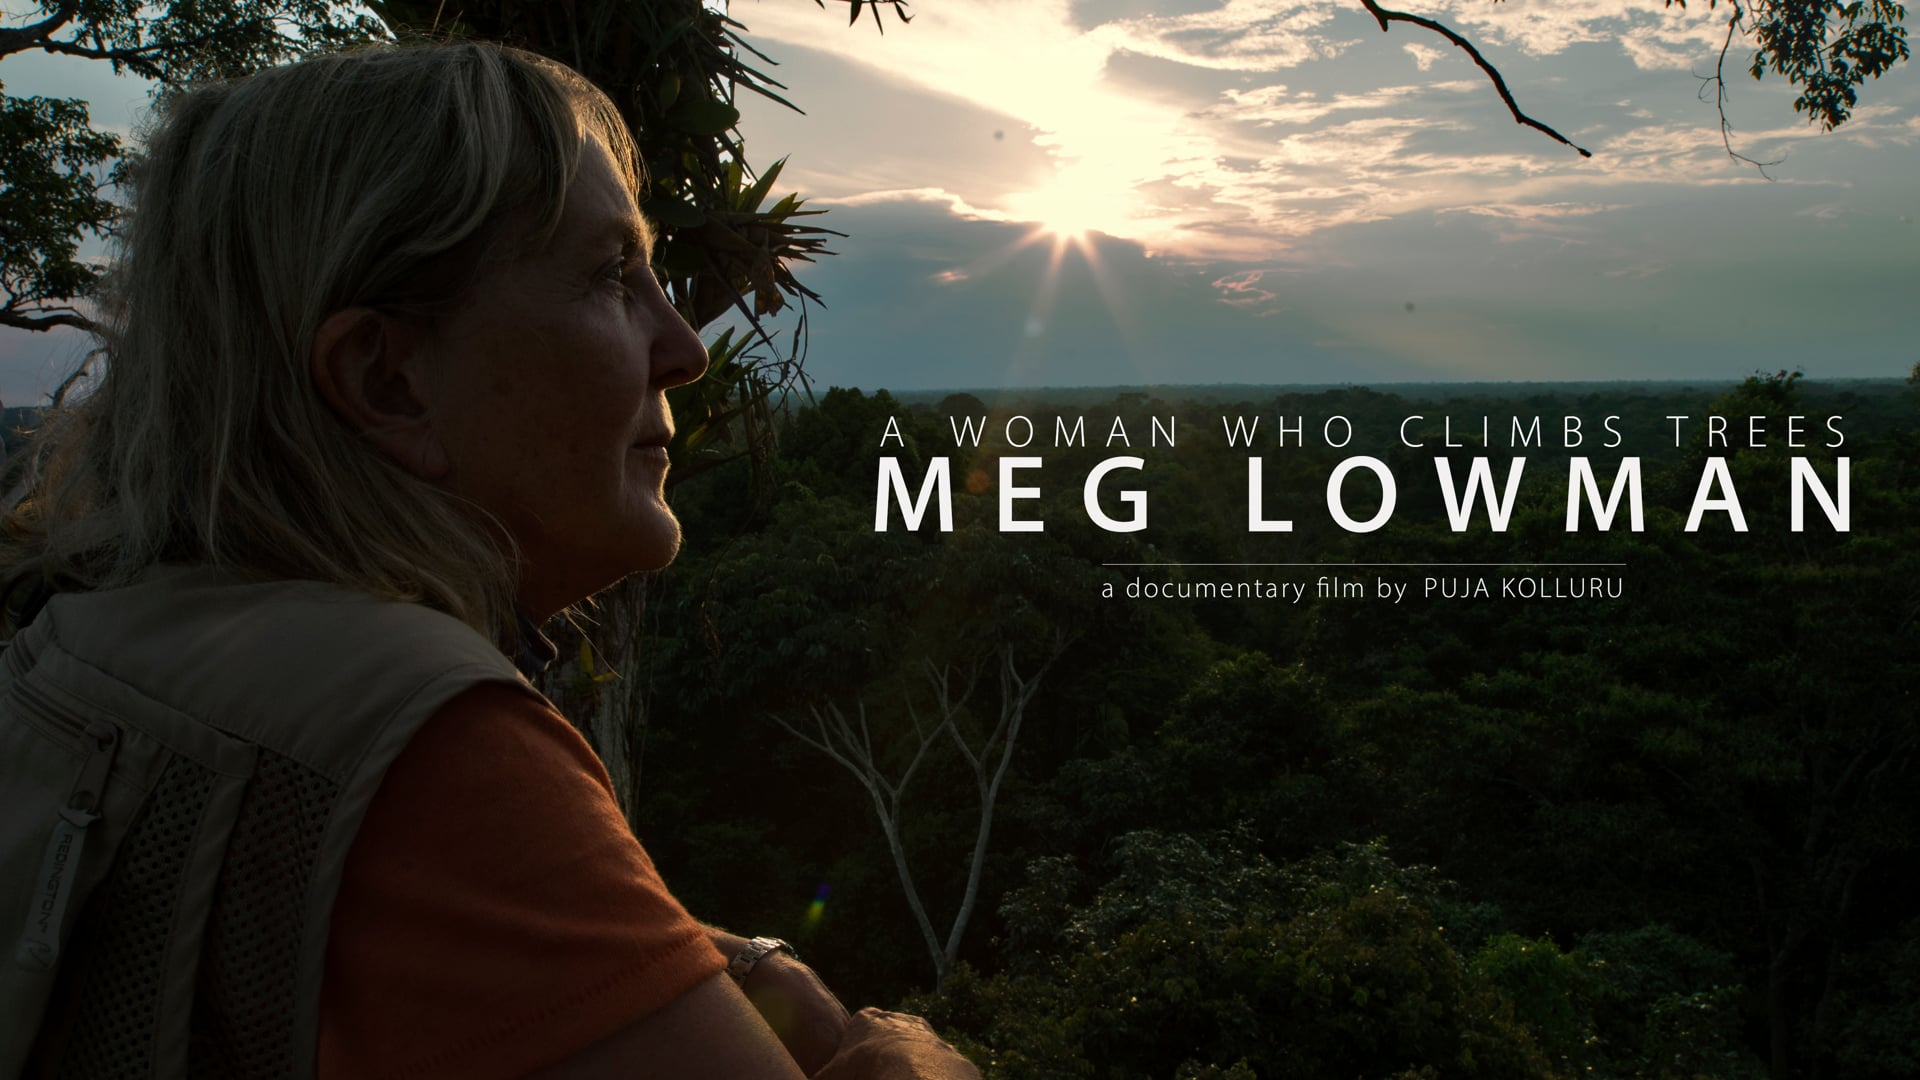 A Woman Who Climbs Trees: Meg Lowman